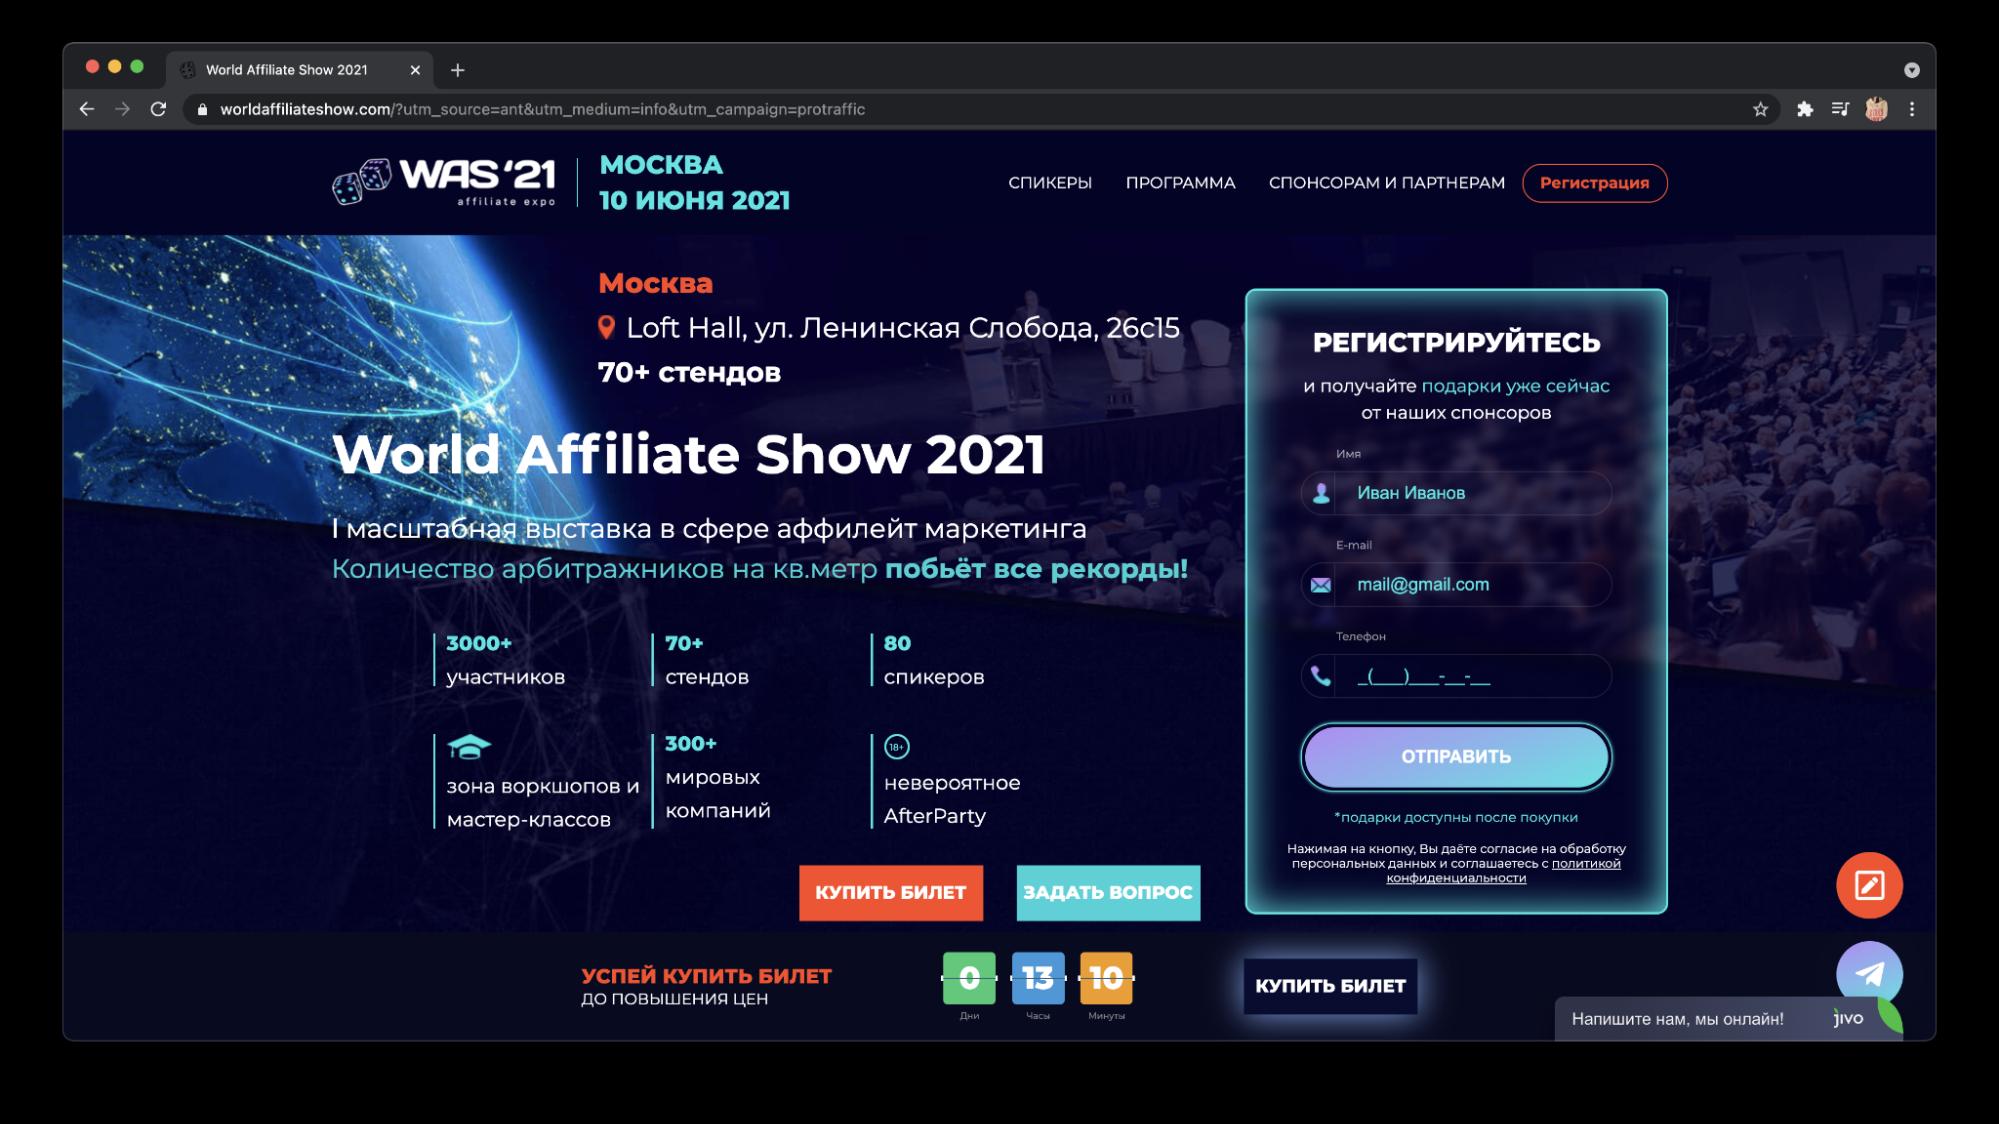 World Affiliate Show 2021 – выставка-шоу с грандиозным AfterParty на 1500 человек!